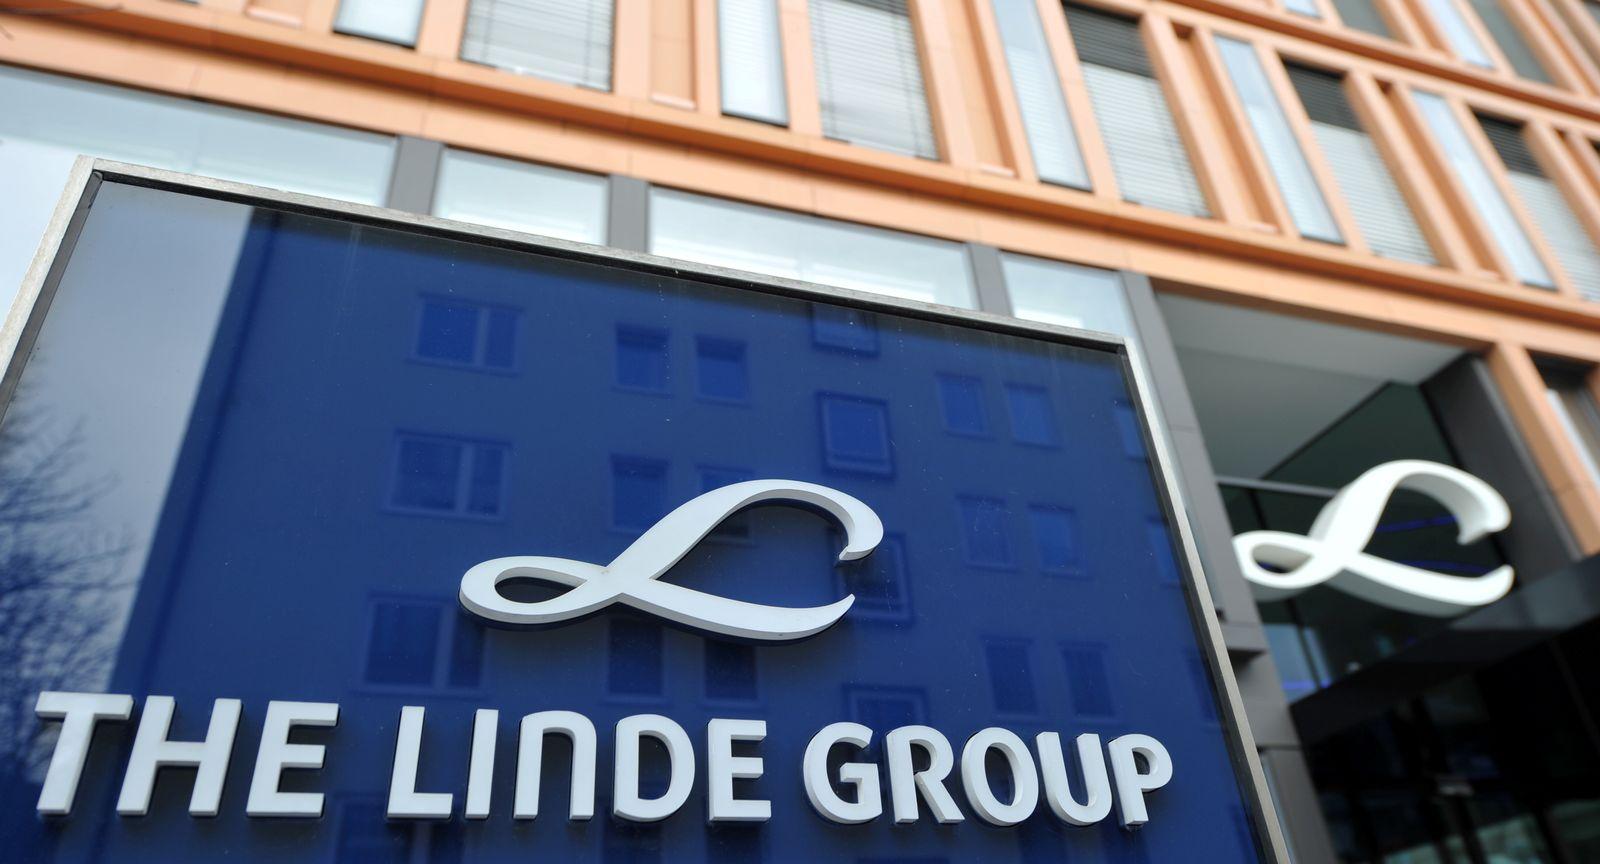 Linde Group Zentrale